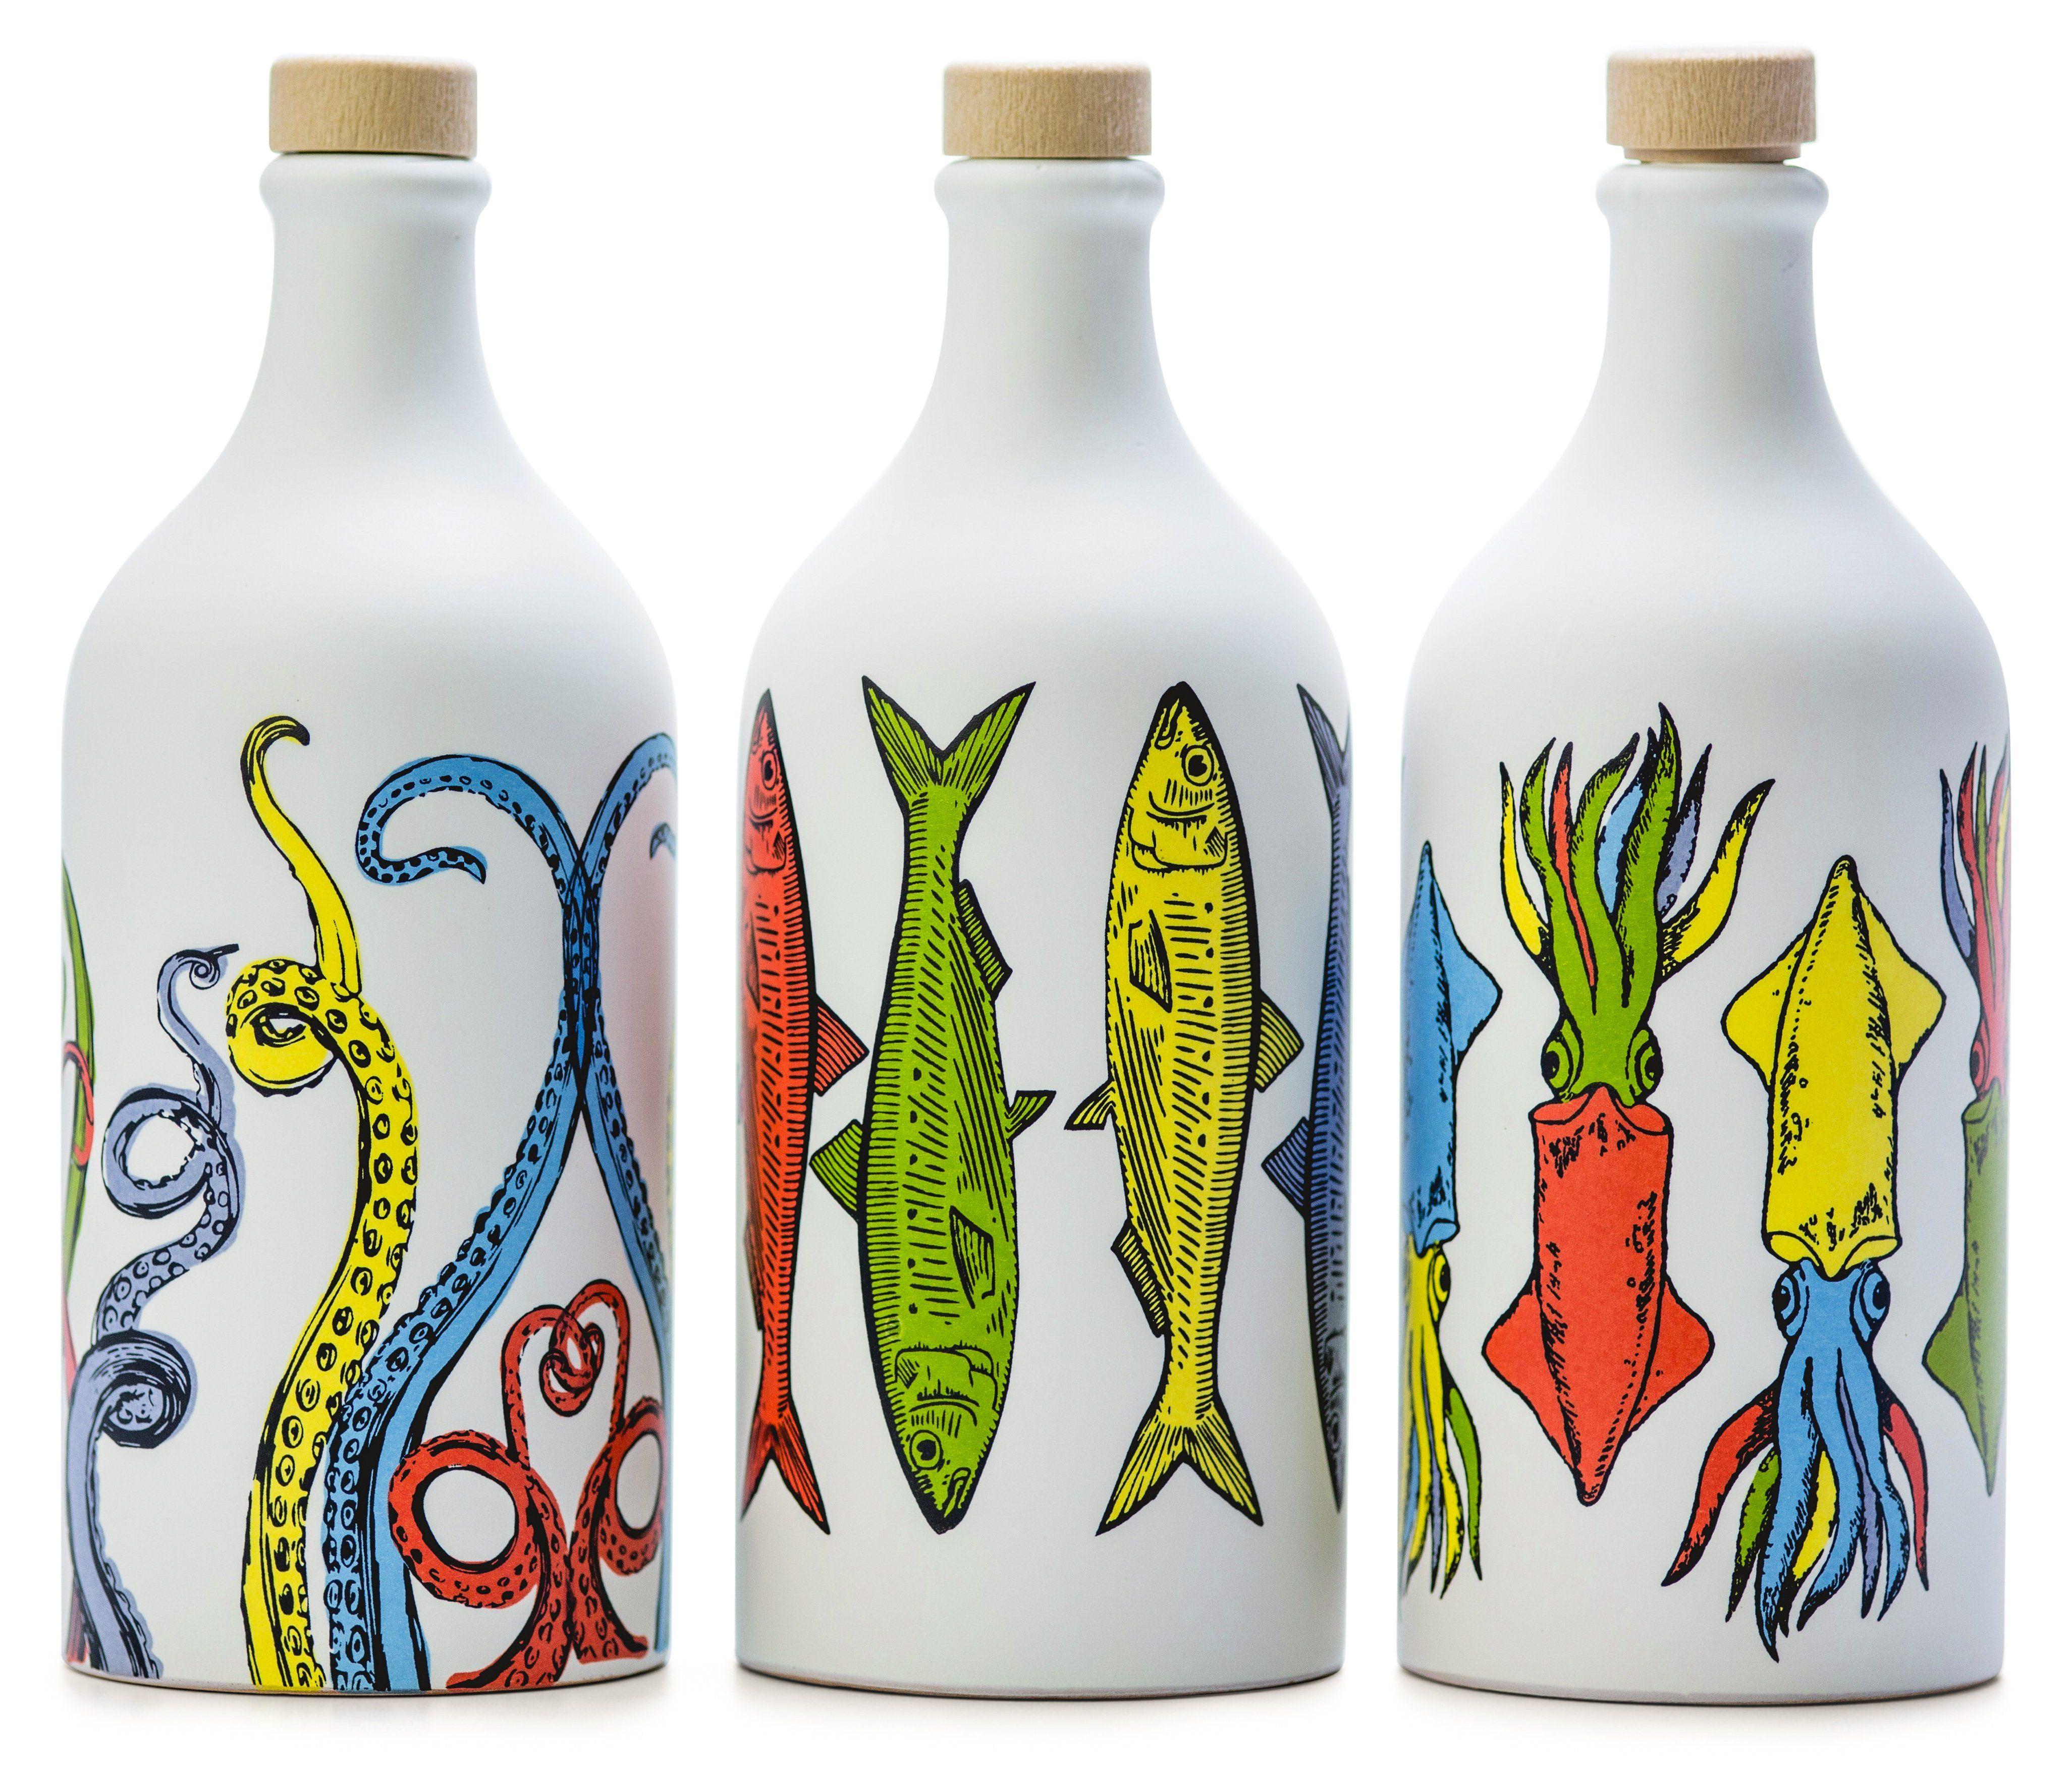 NEW ! Antico Frantoio Muraglia, Extra Virgin Olive Oil, POP ART Collection, Set of 3: Tentacles, Sardines & Cuttlefish, Handmade Ceramic Jars 17 Fl.oz (500 ml)